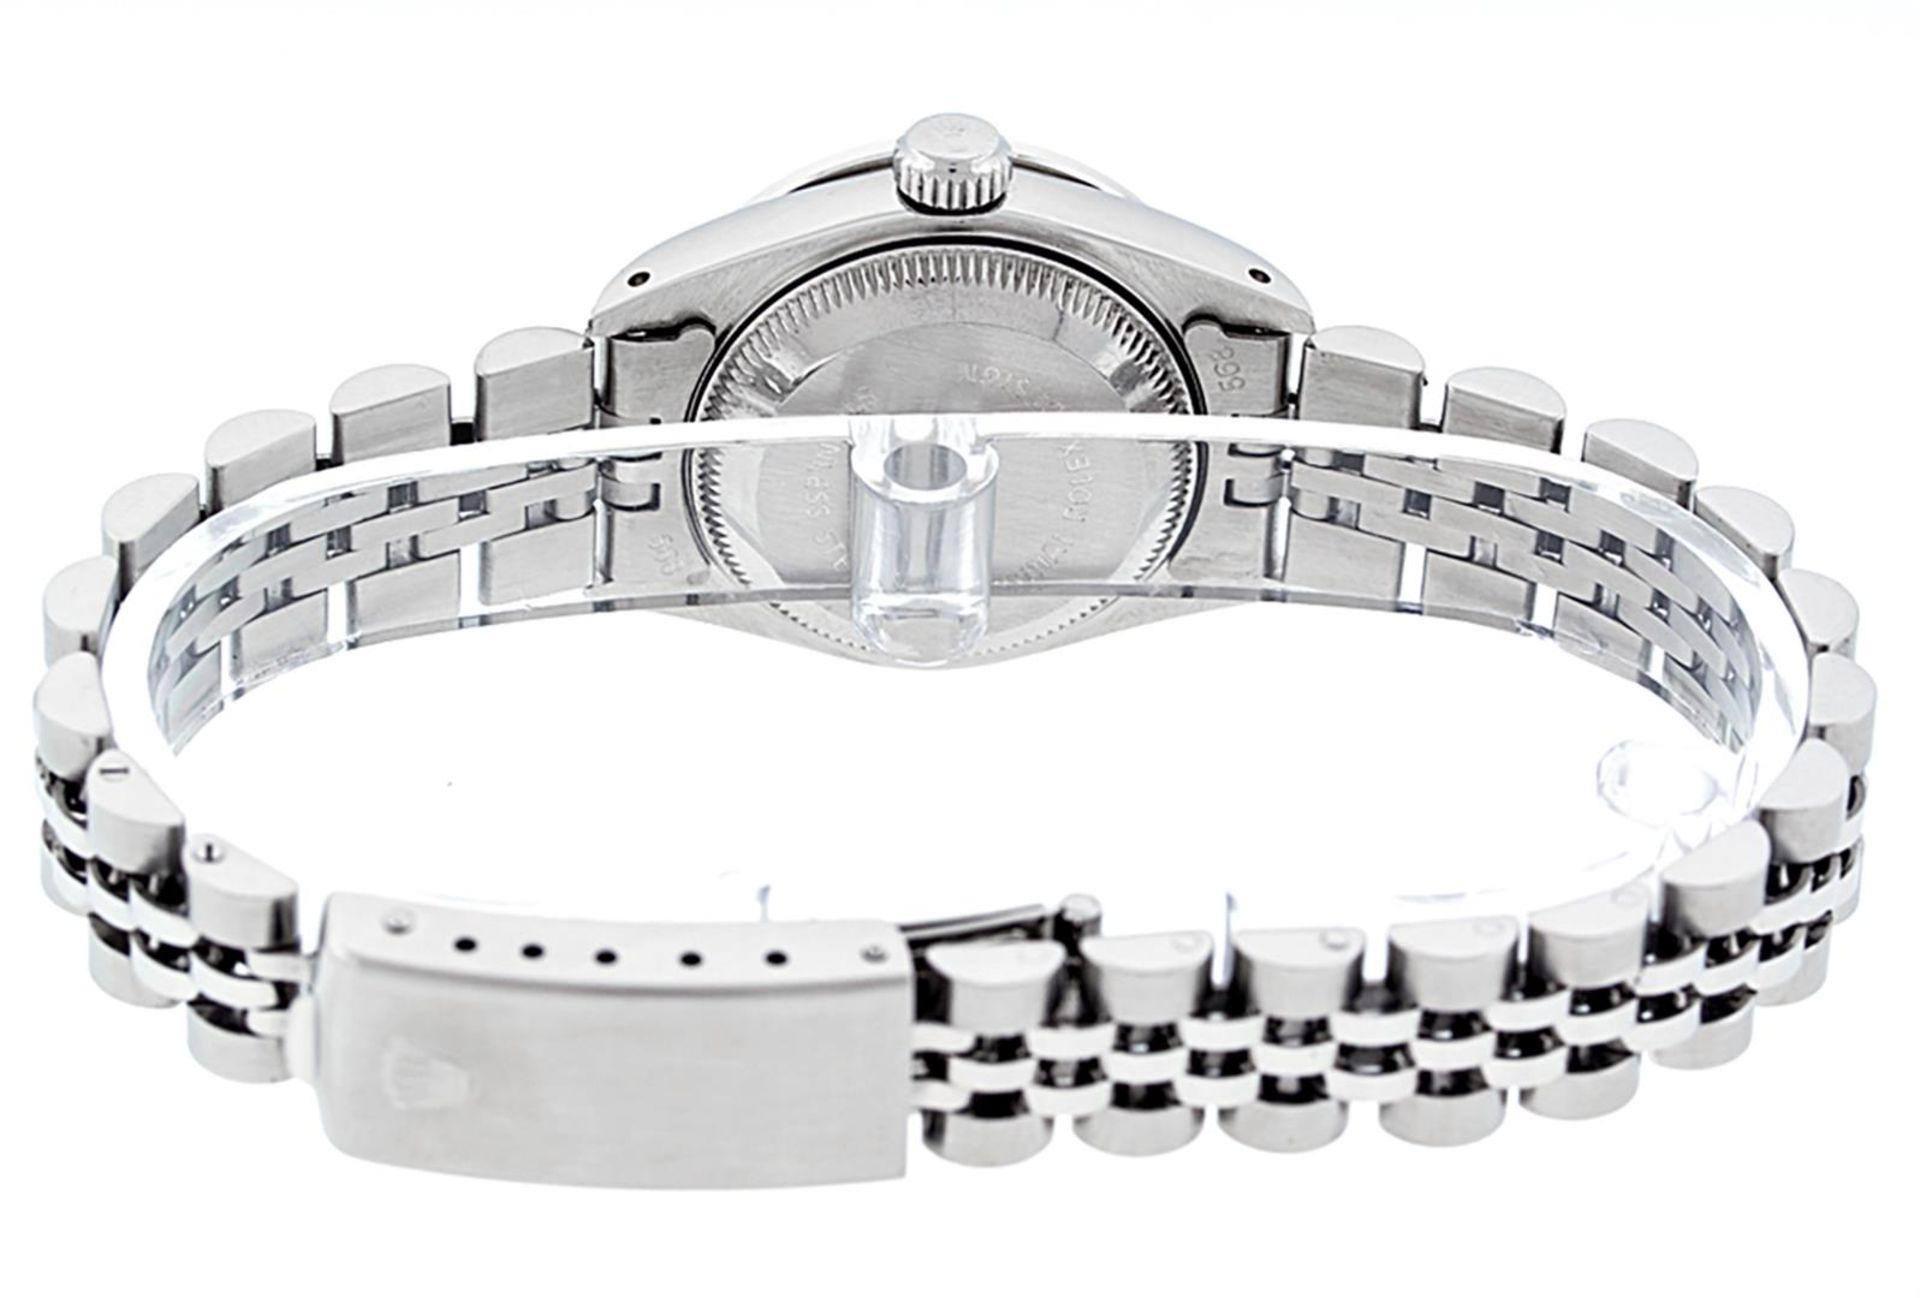 Rolex Ladies Stainless Steel 26MM Purple String Diamond Lugs Datejust Wristwatch - Image 4 of 9